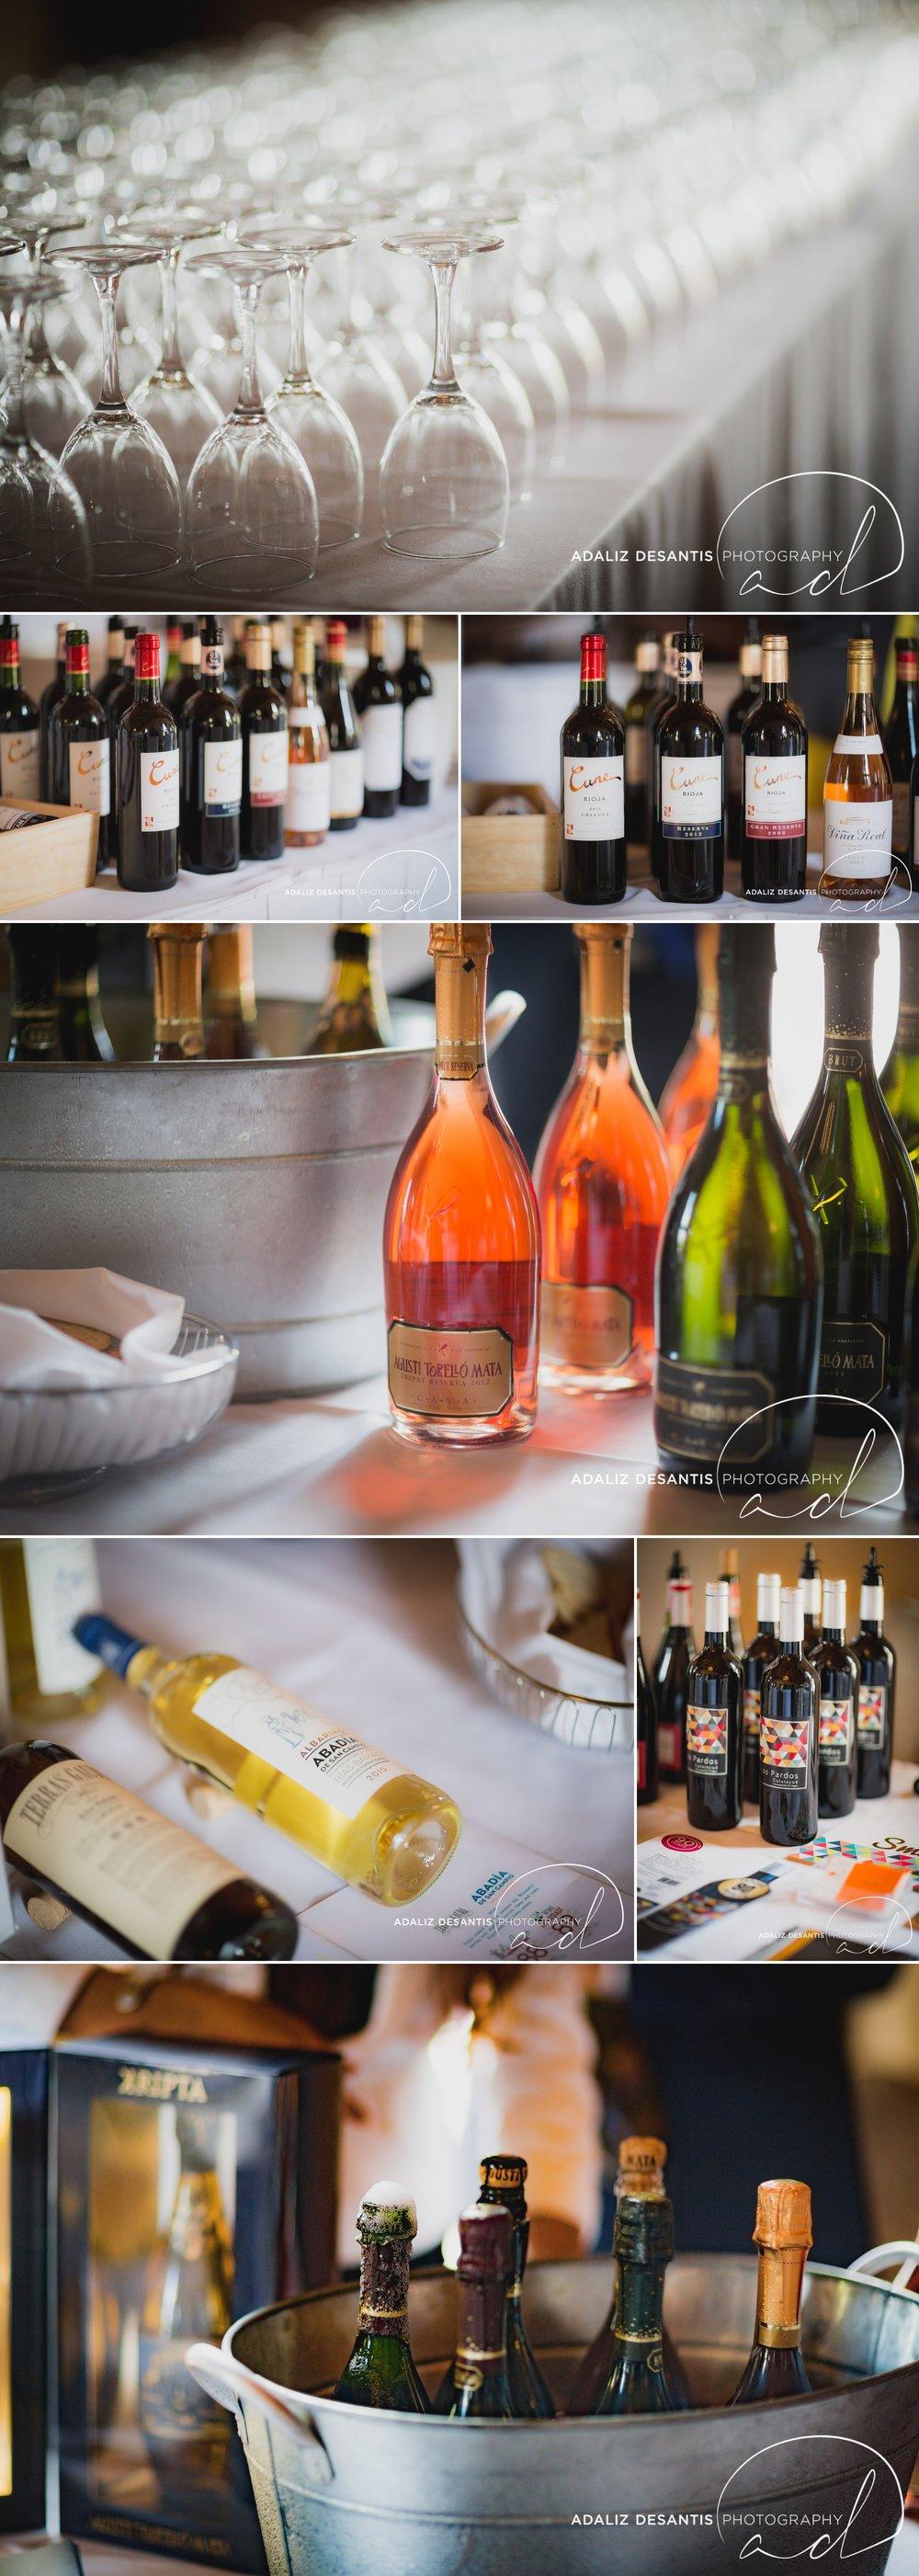 hidalgo imports anniversary wine spirits tasting biltmore hotel coral gables florida miami 1.jpg